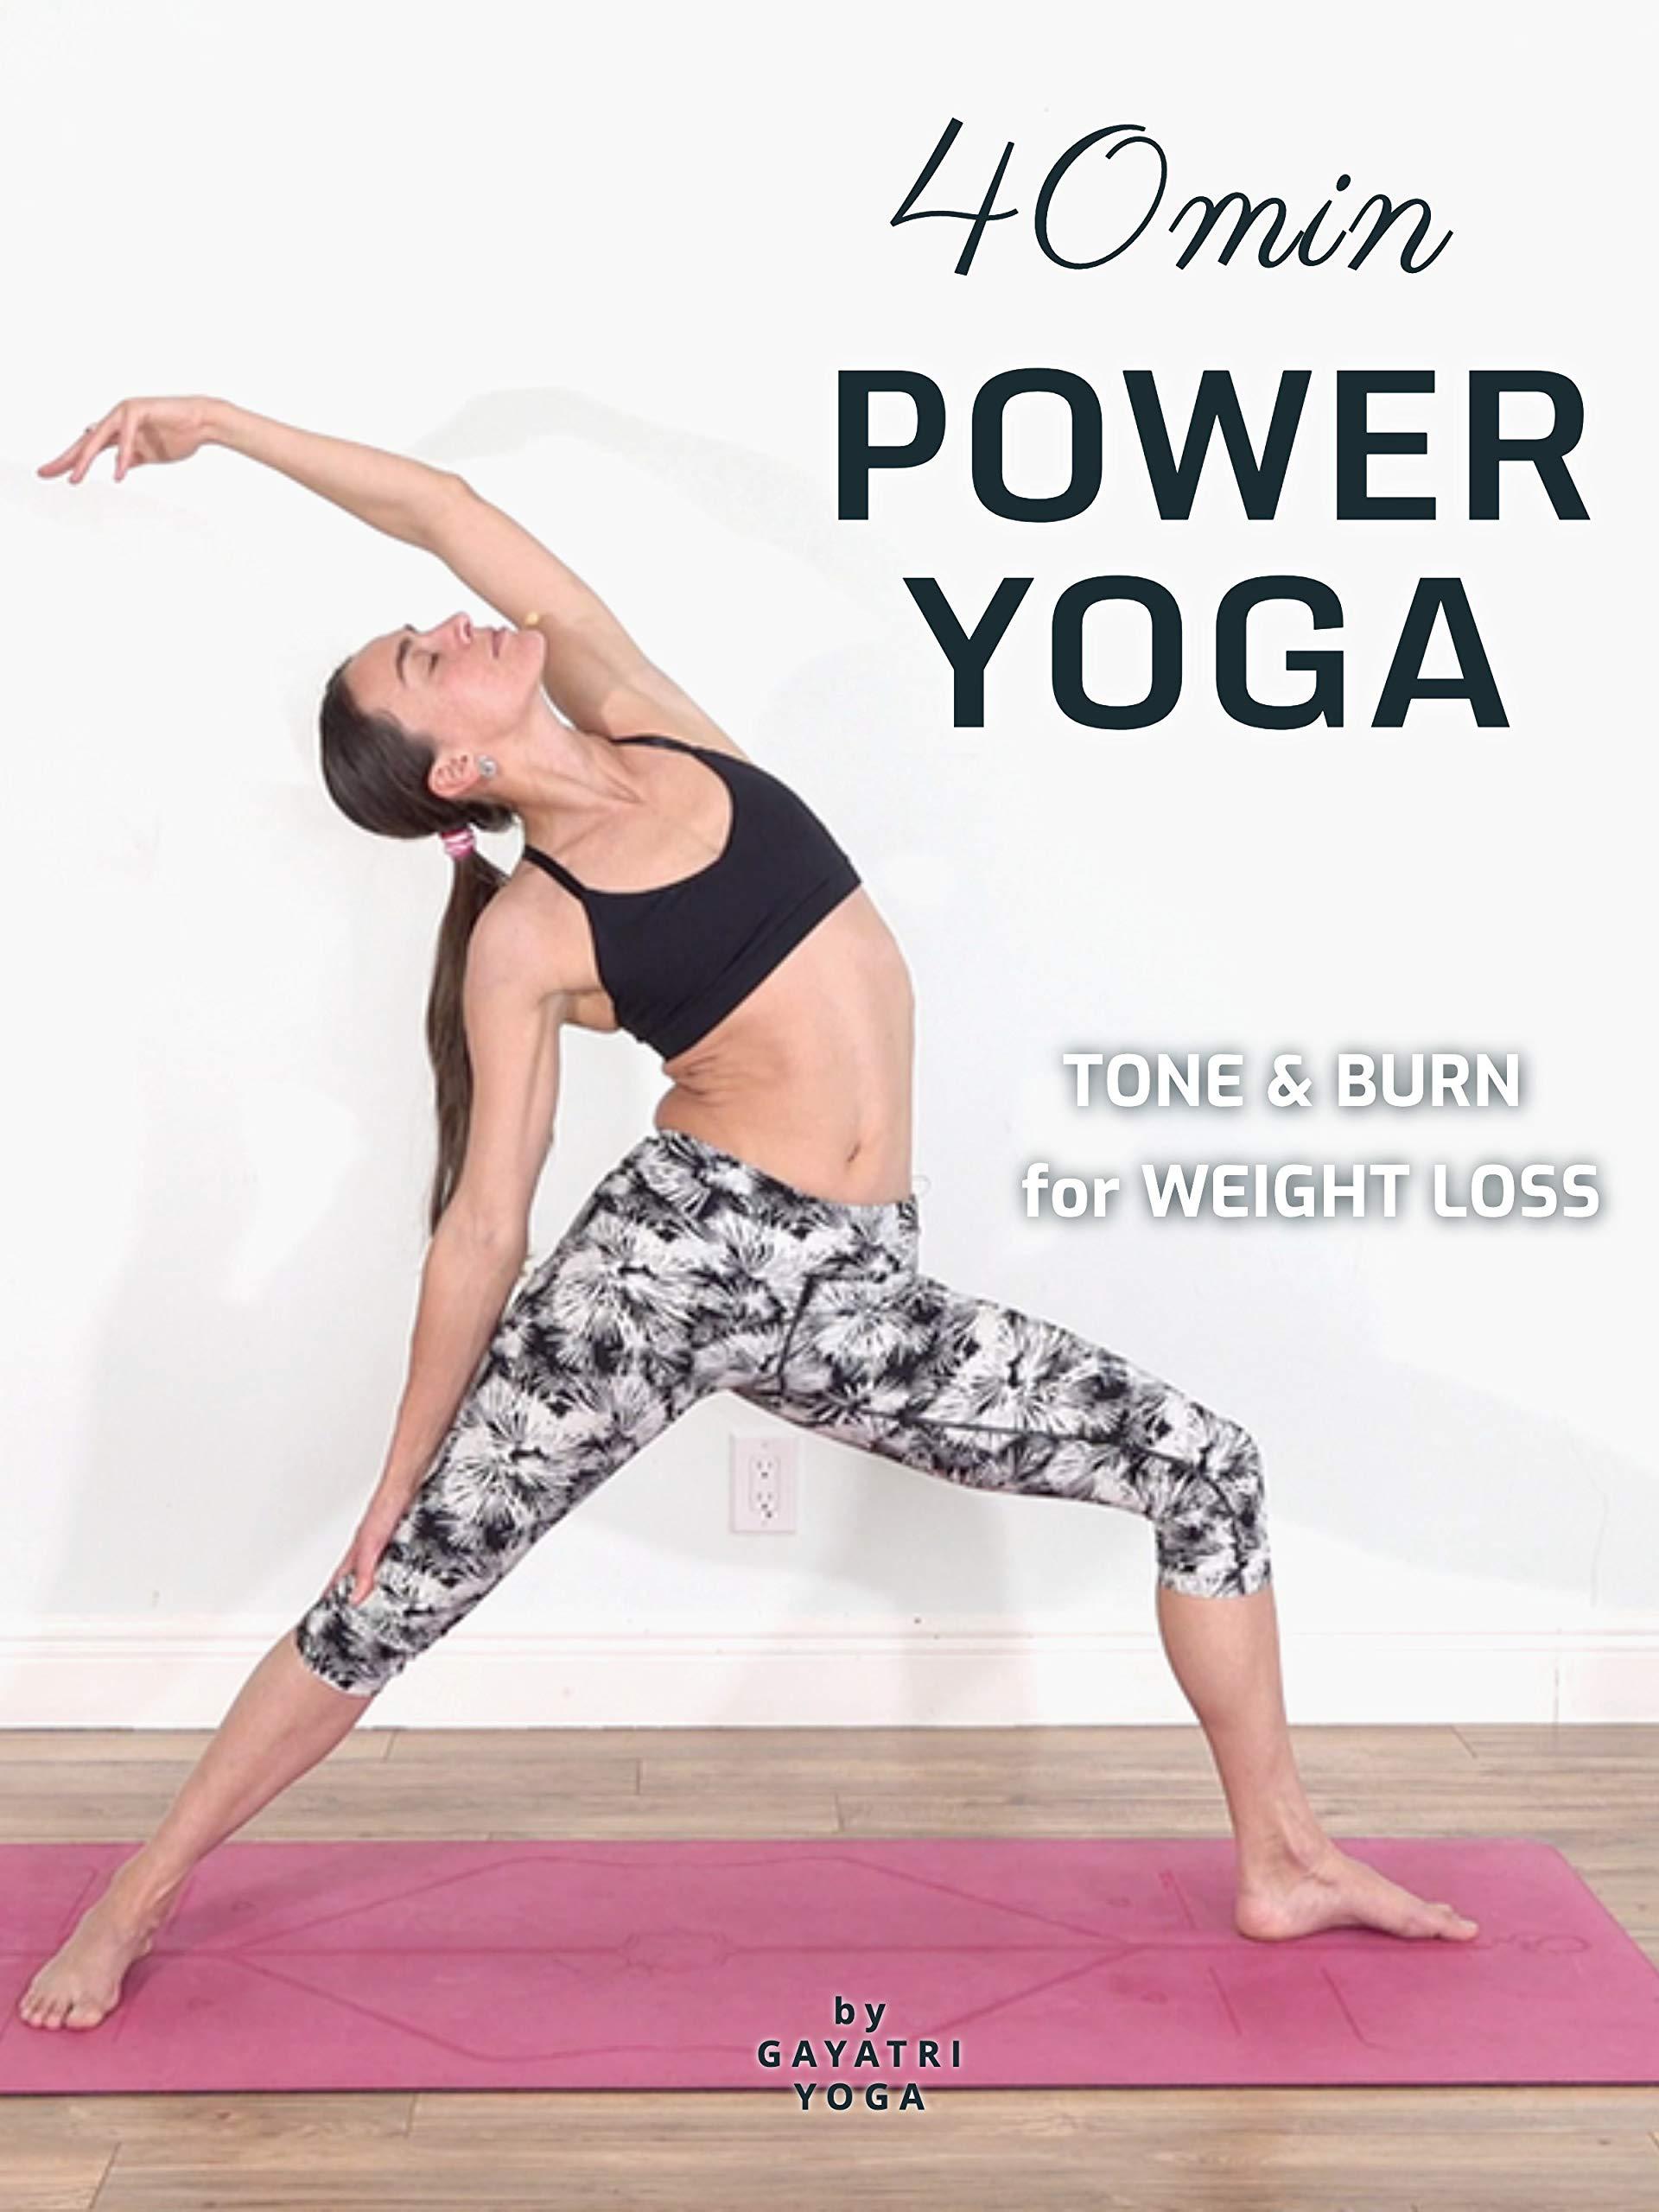 40 Min Power Yoga - Tone & Burn for Weight Loss | Gayatri Yoga